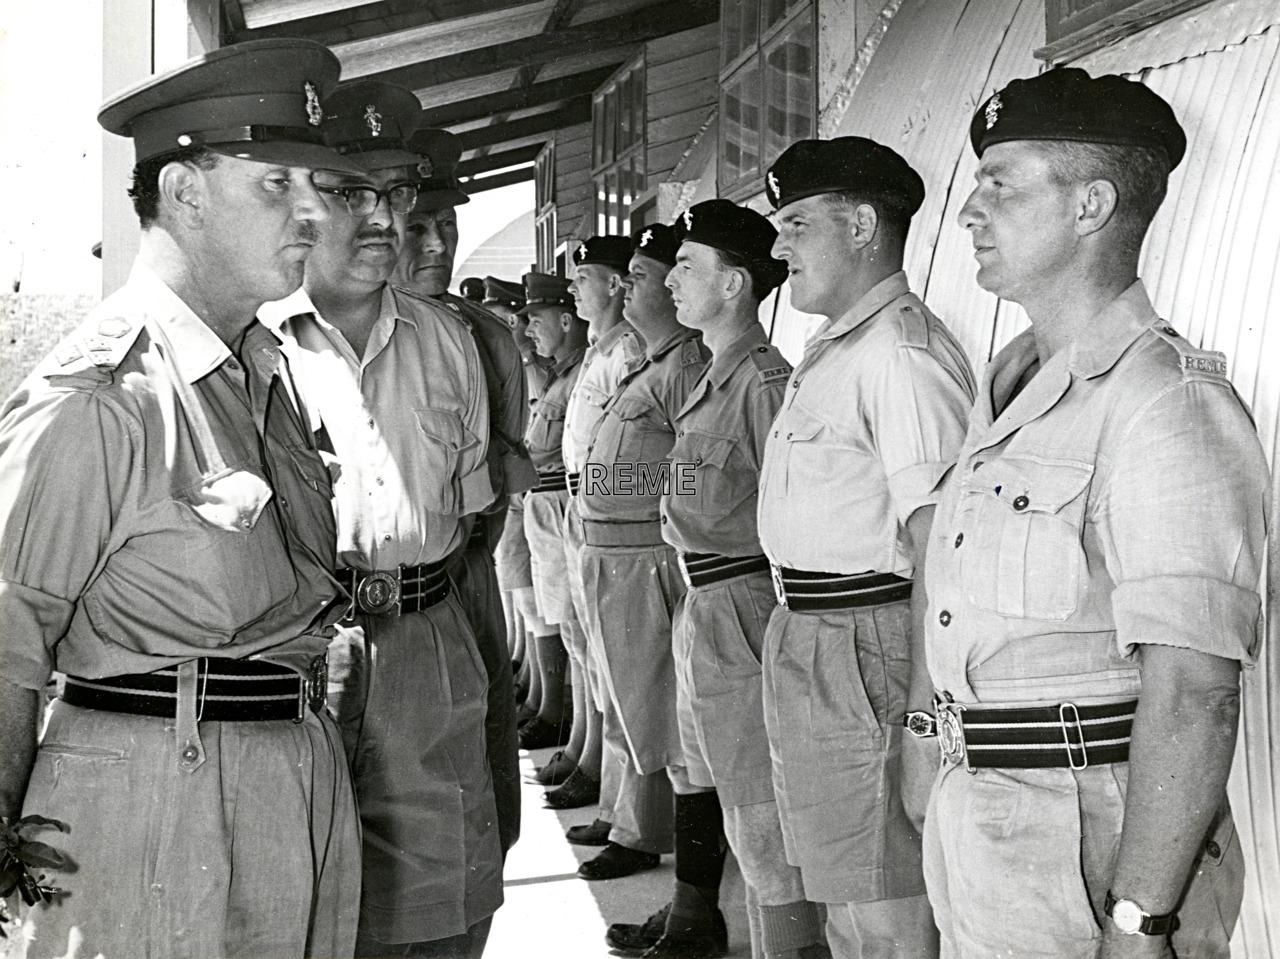 Visit of Brigadier MF Scott, Inspector of REME, to 9 Infantry Workshop REME, Cyprus